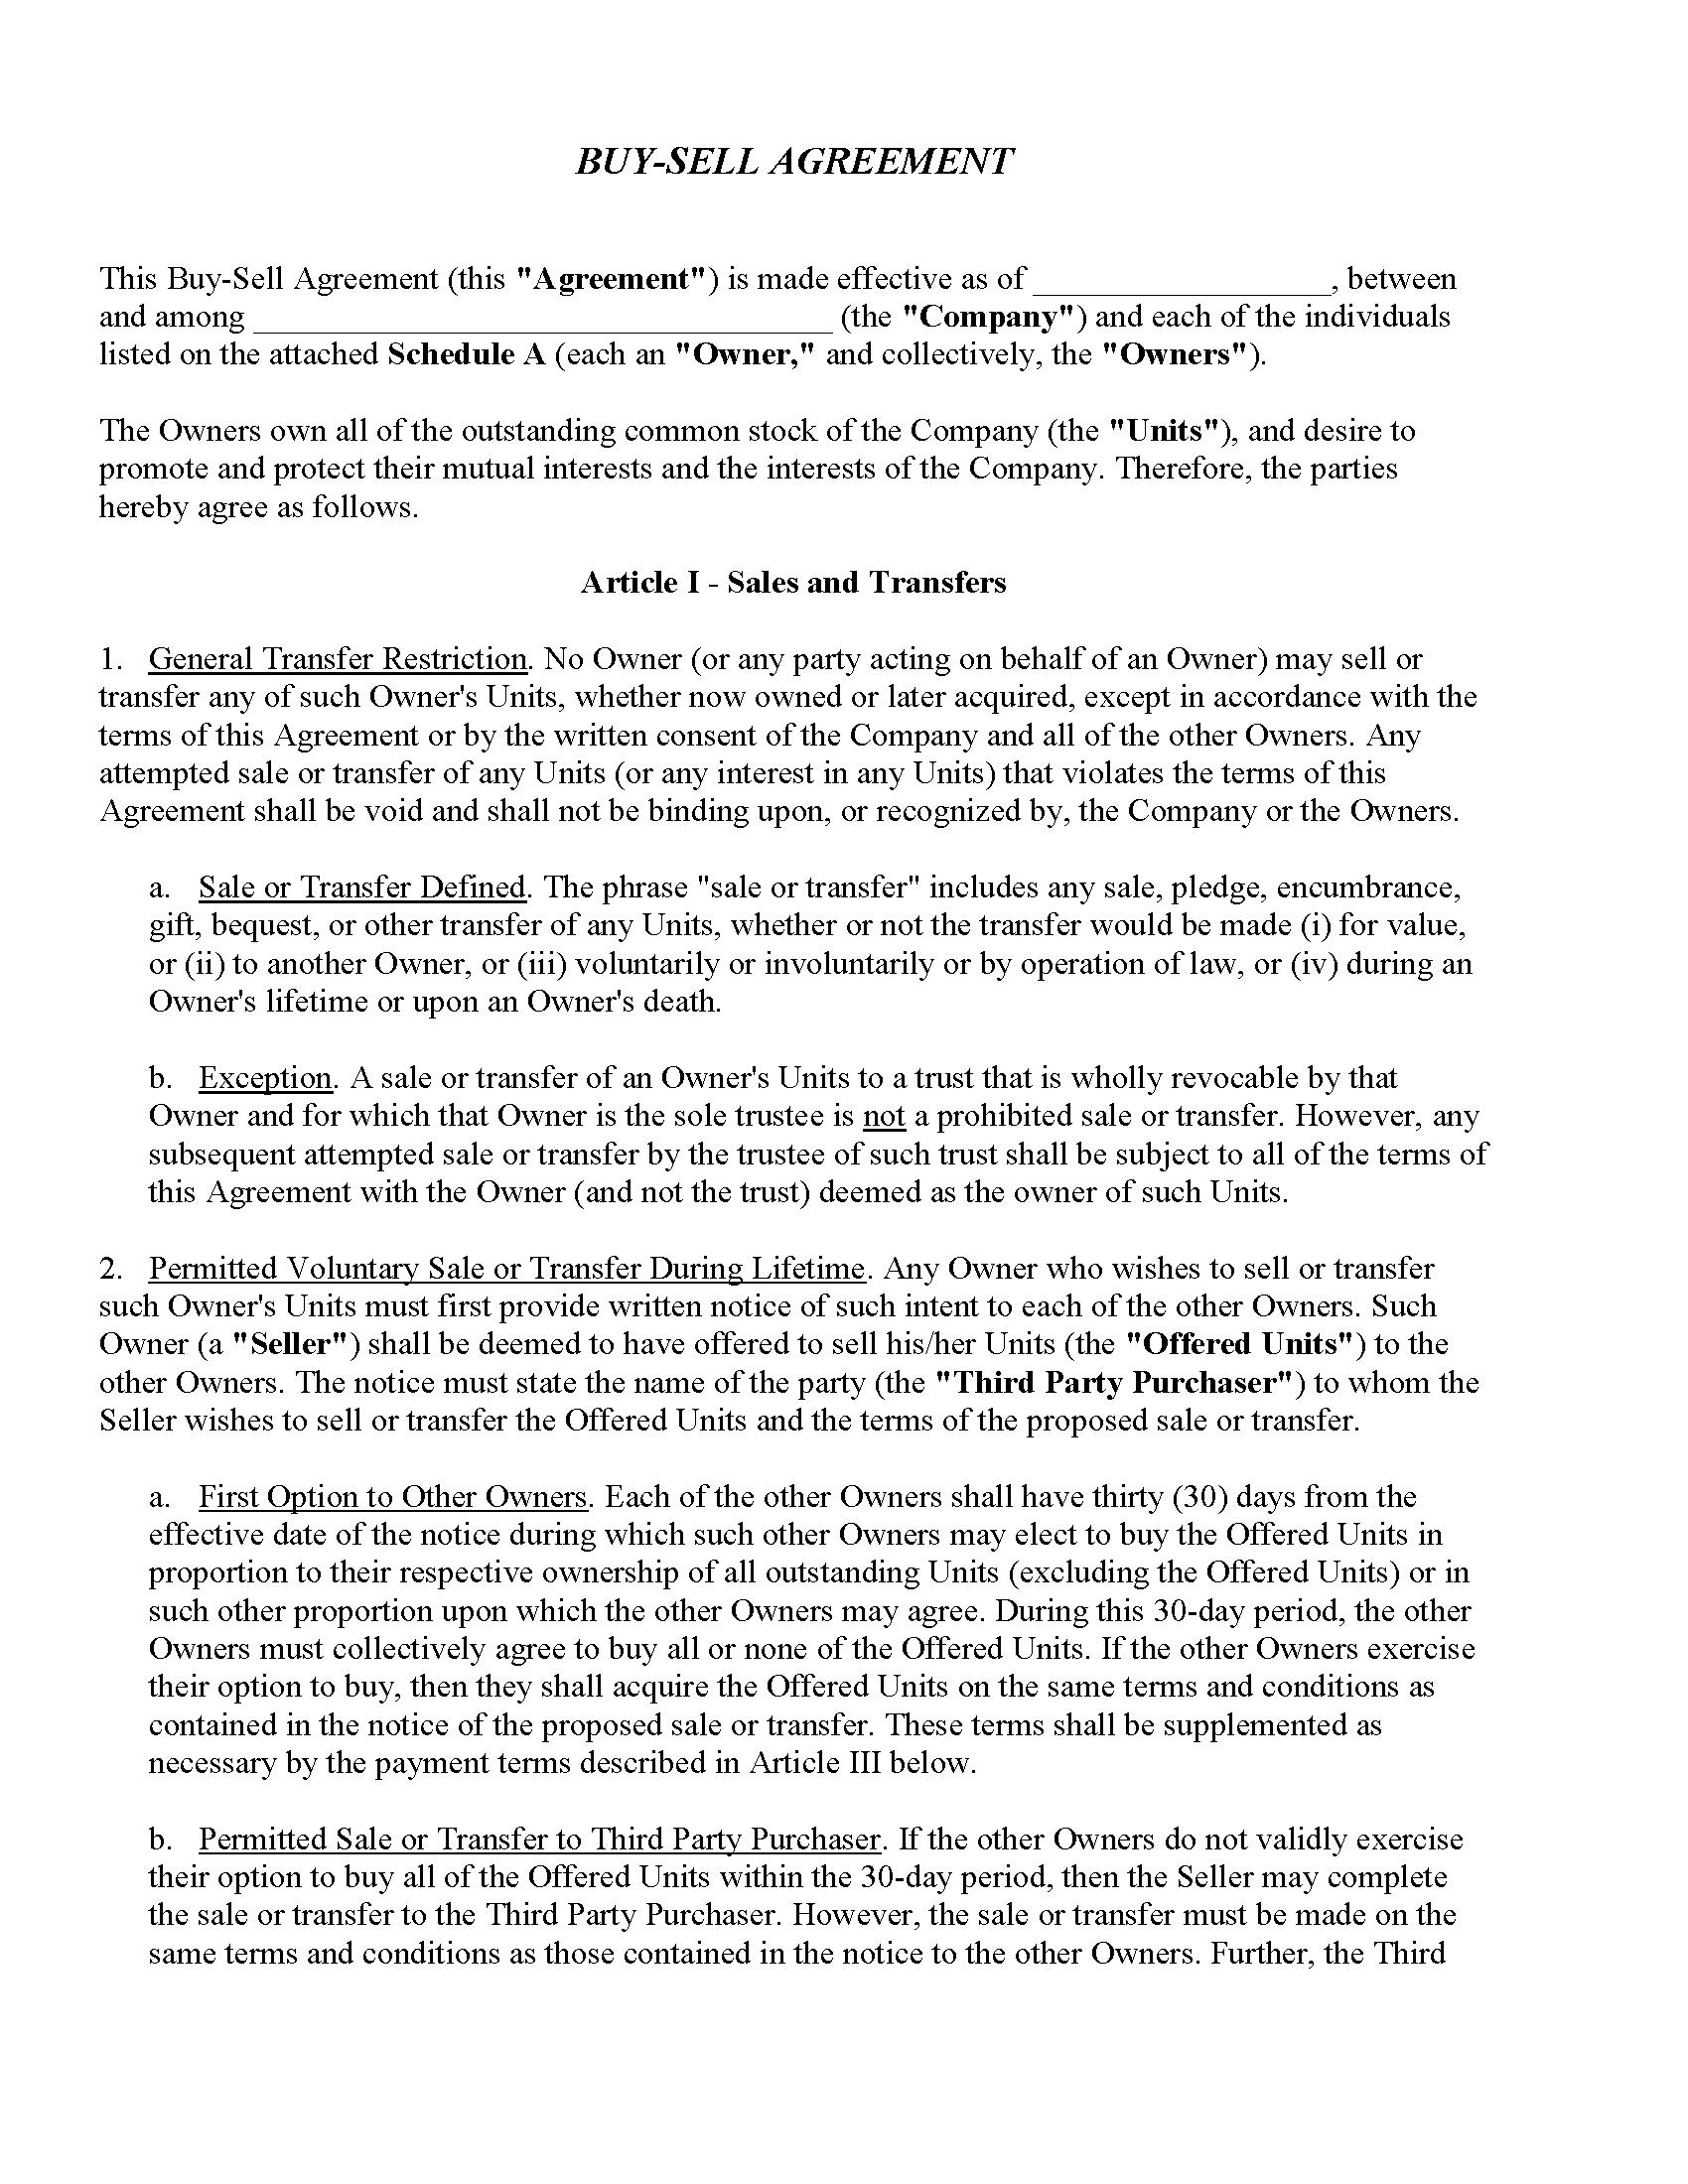 Florida Buy-Sell Agreement